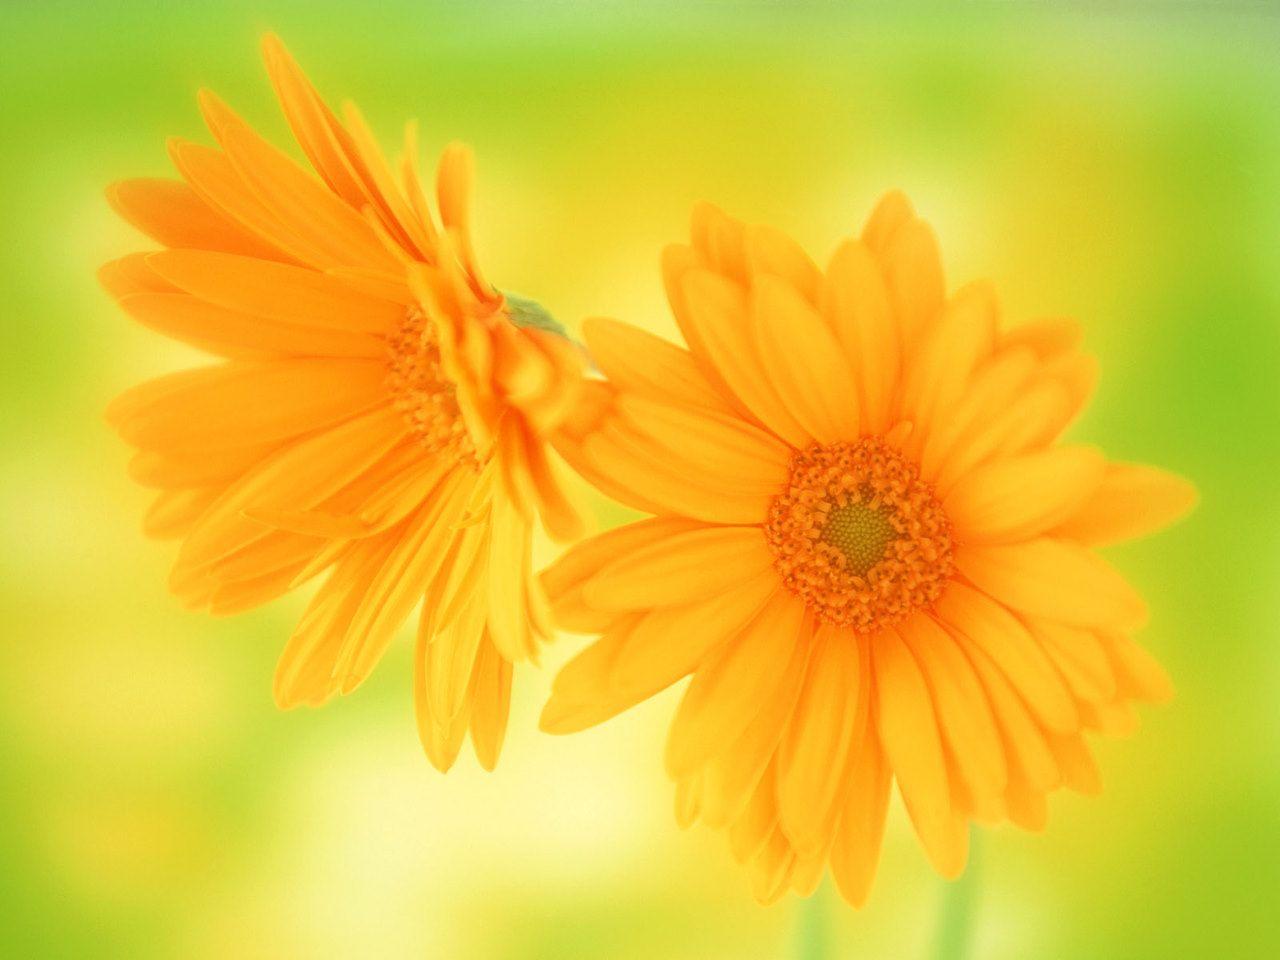 Beautiful paintings yellow daisy beautiful flowers wallpaper beautiful paintings yellow daisy beautiful flowers wallpaper izmirmasajfo